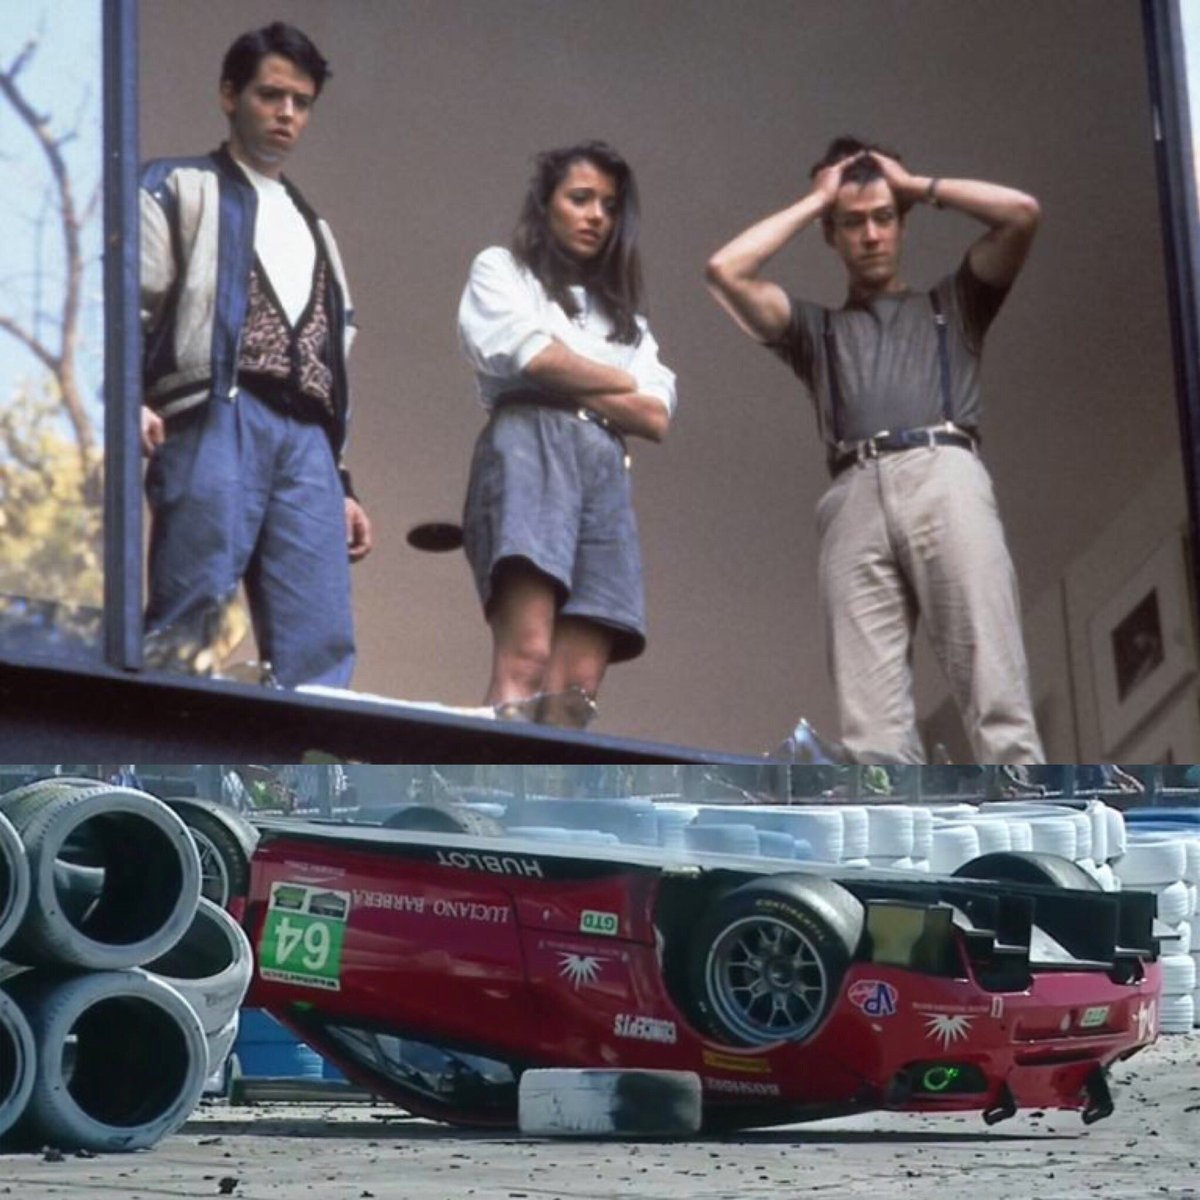 #Sebring12 #IMSA #Ferrari https://t.co/D...